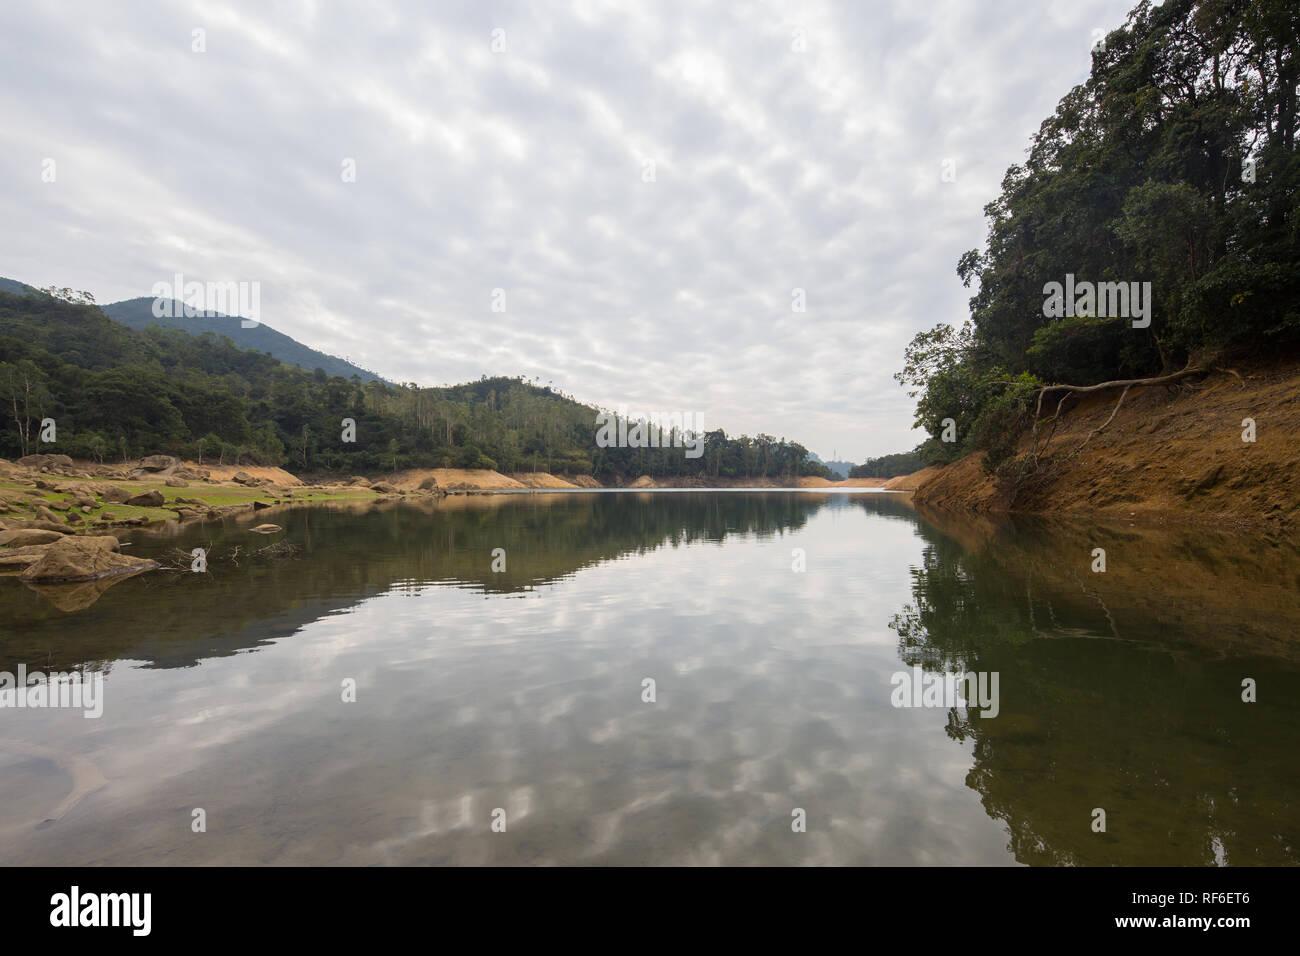 Reflection of the sky on Shing Mun Reservoir, Hong Kong - Stock Image